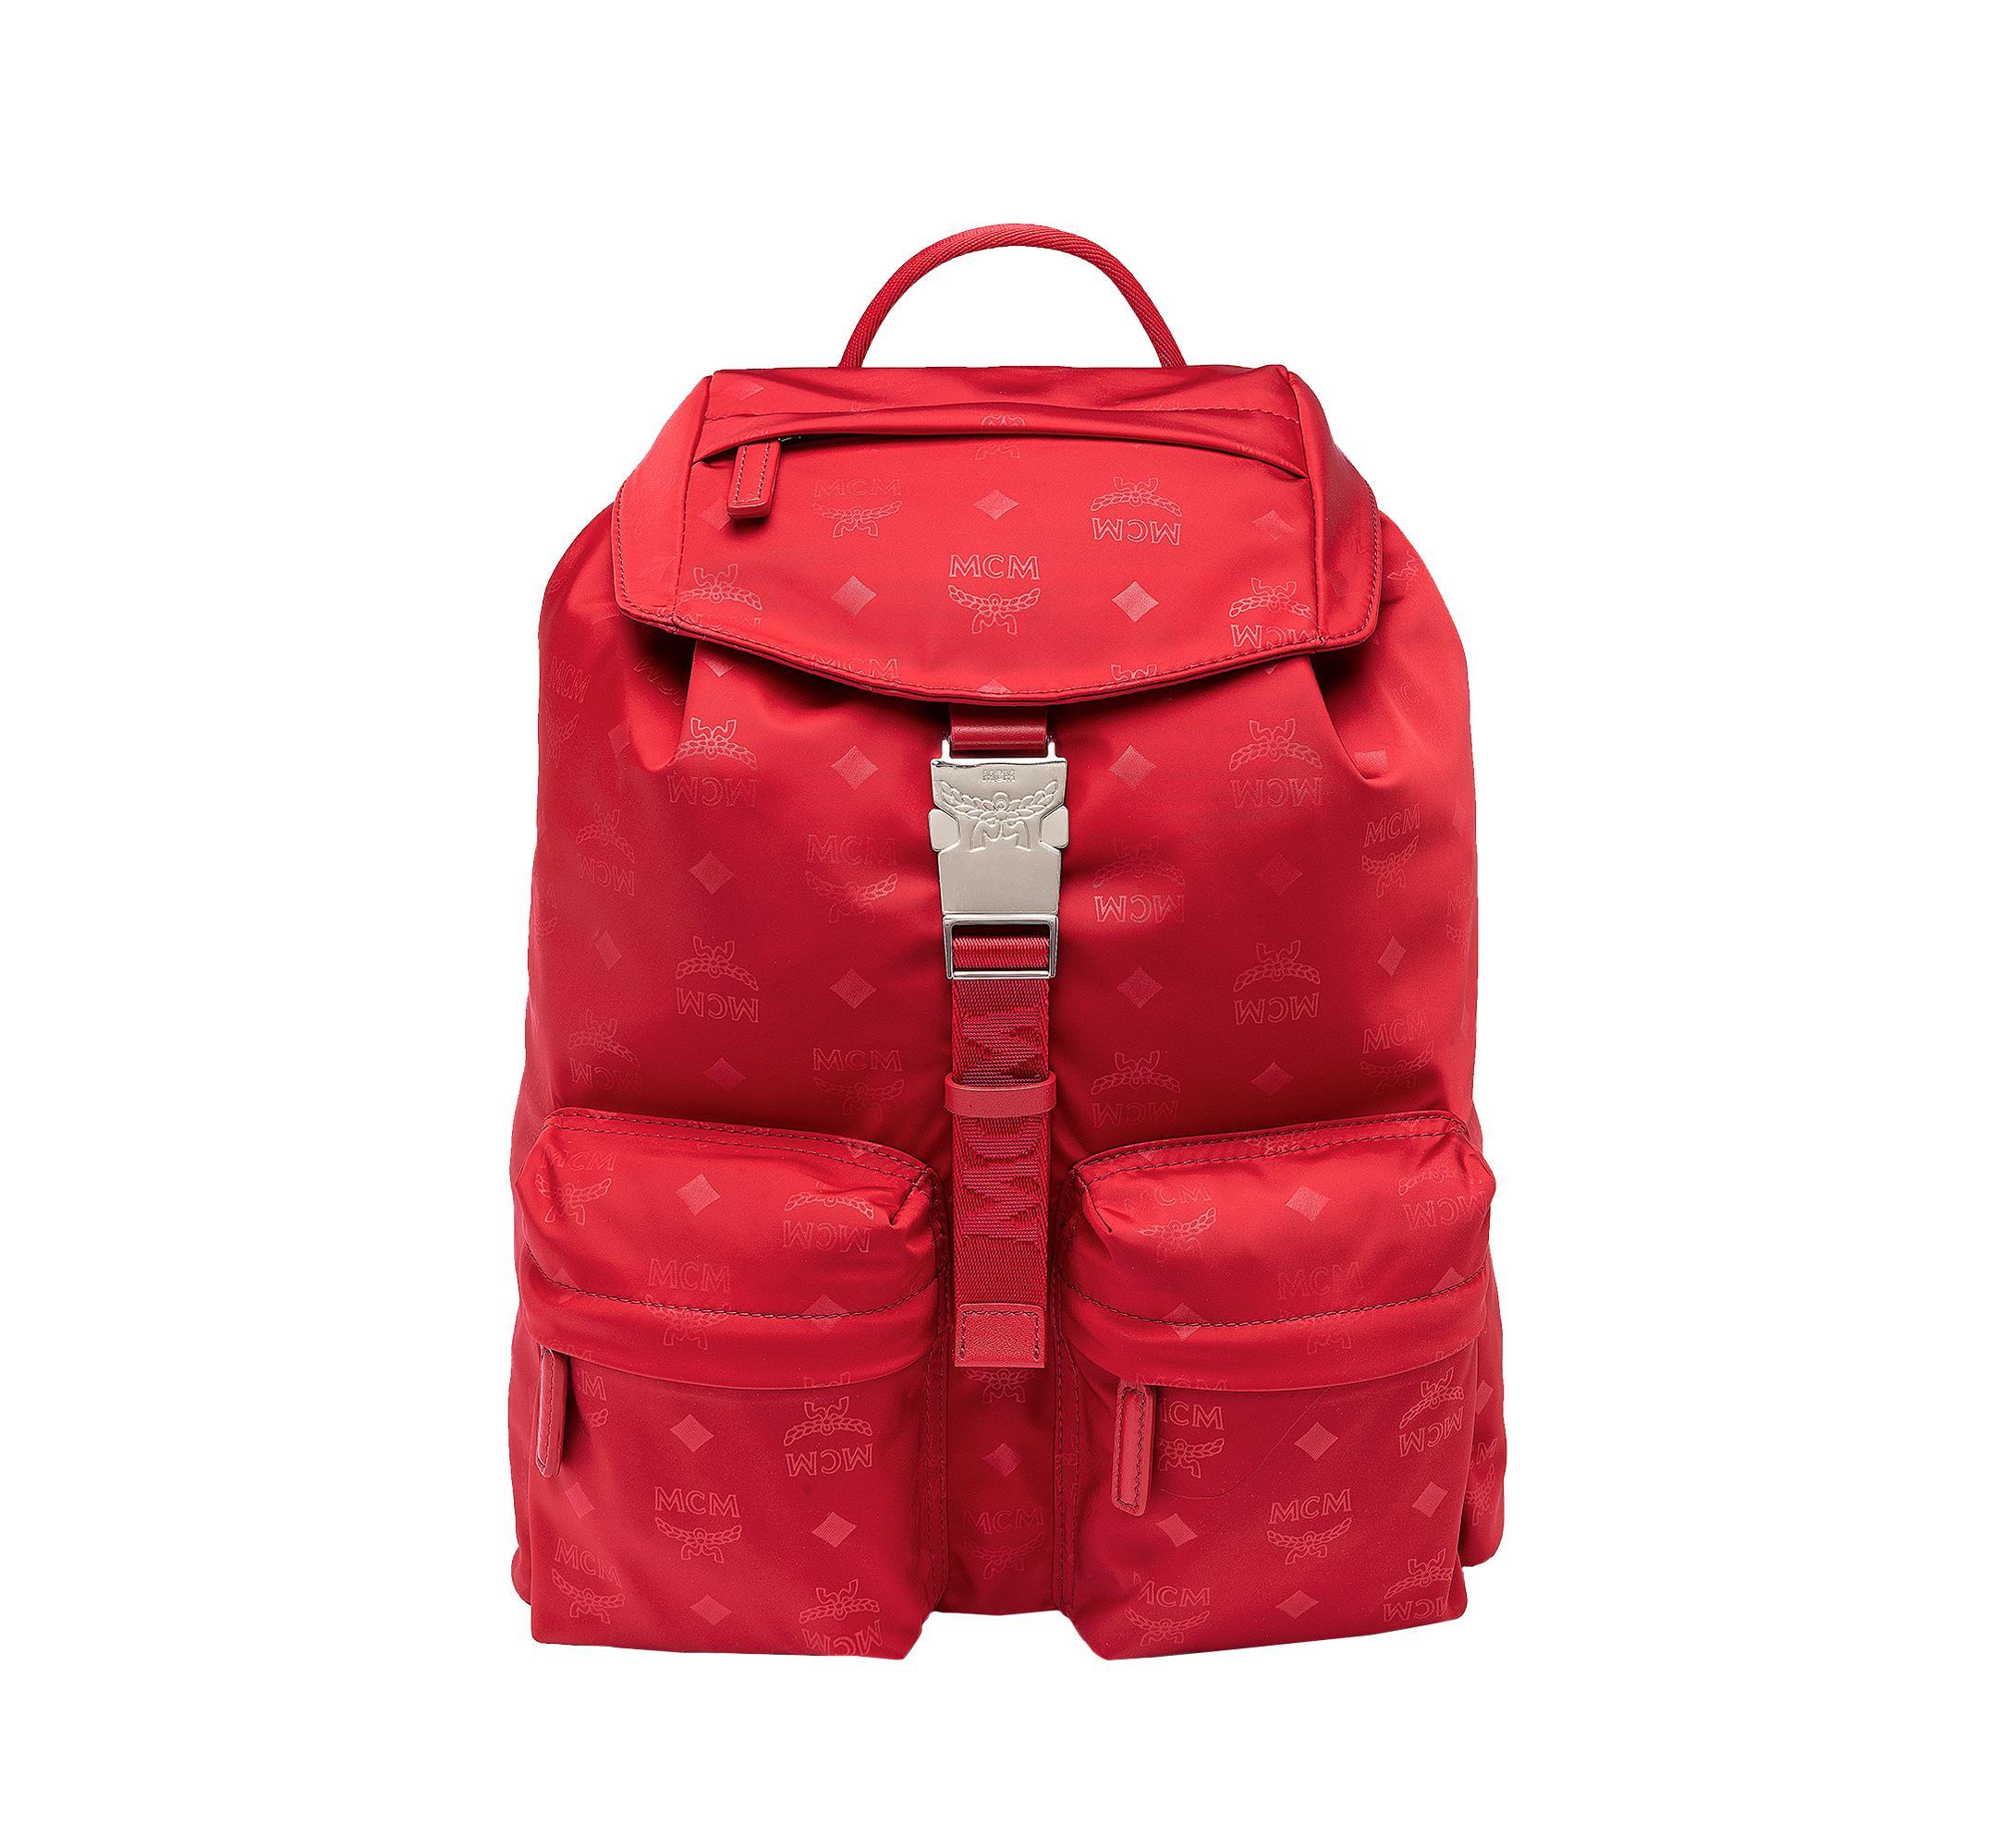 e2f7ca785f2a MCM Dieter Two Pocket Backpack In Monogram Nylon in Red for Men ...